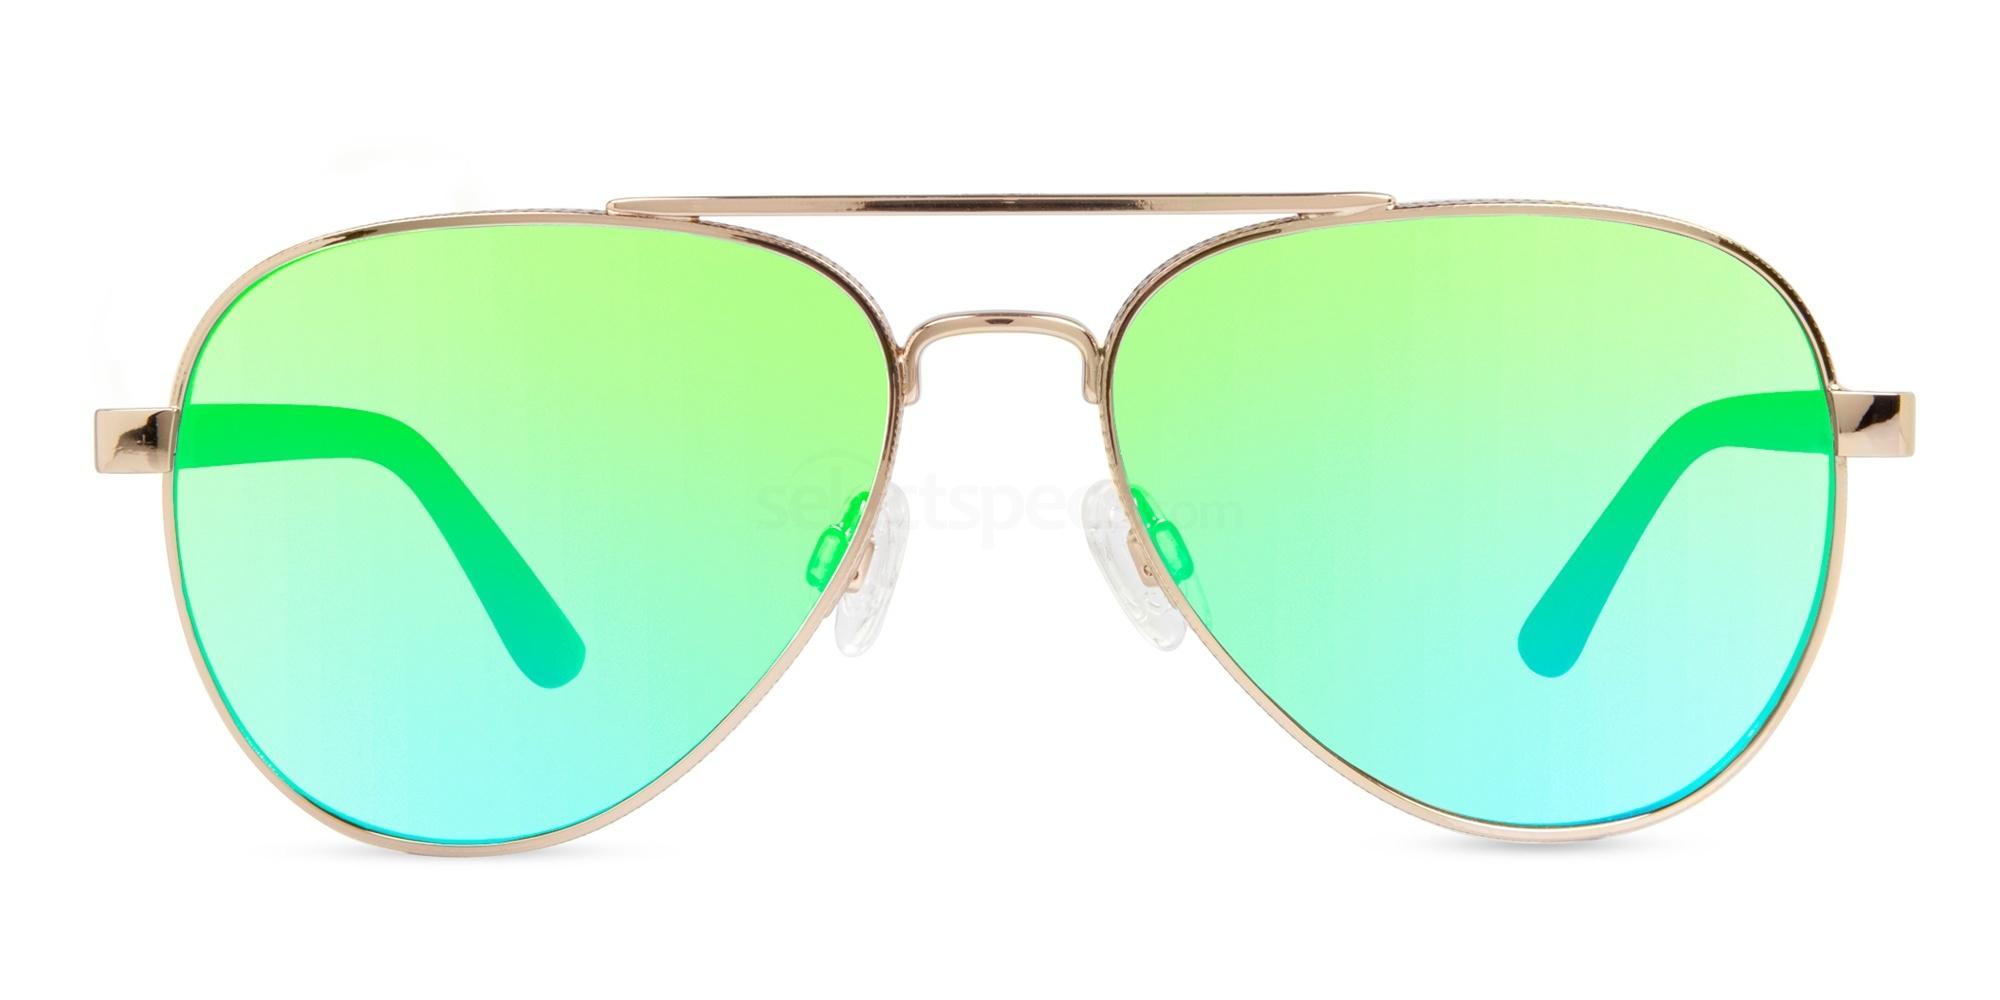 revo-green-water-lens-sunglasses